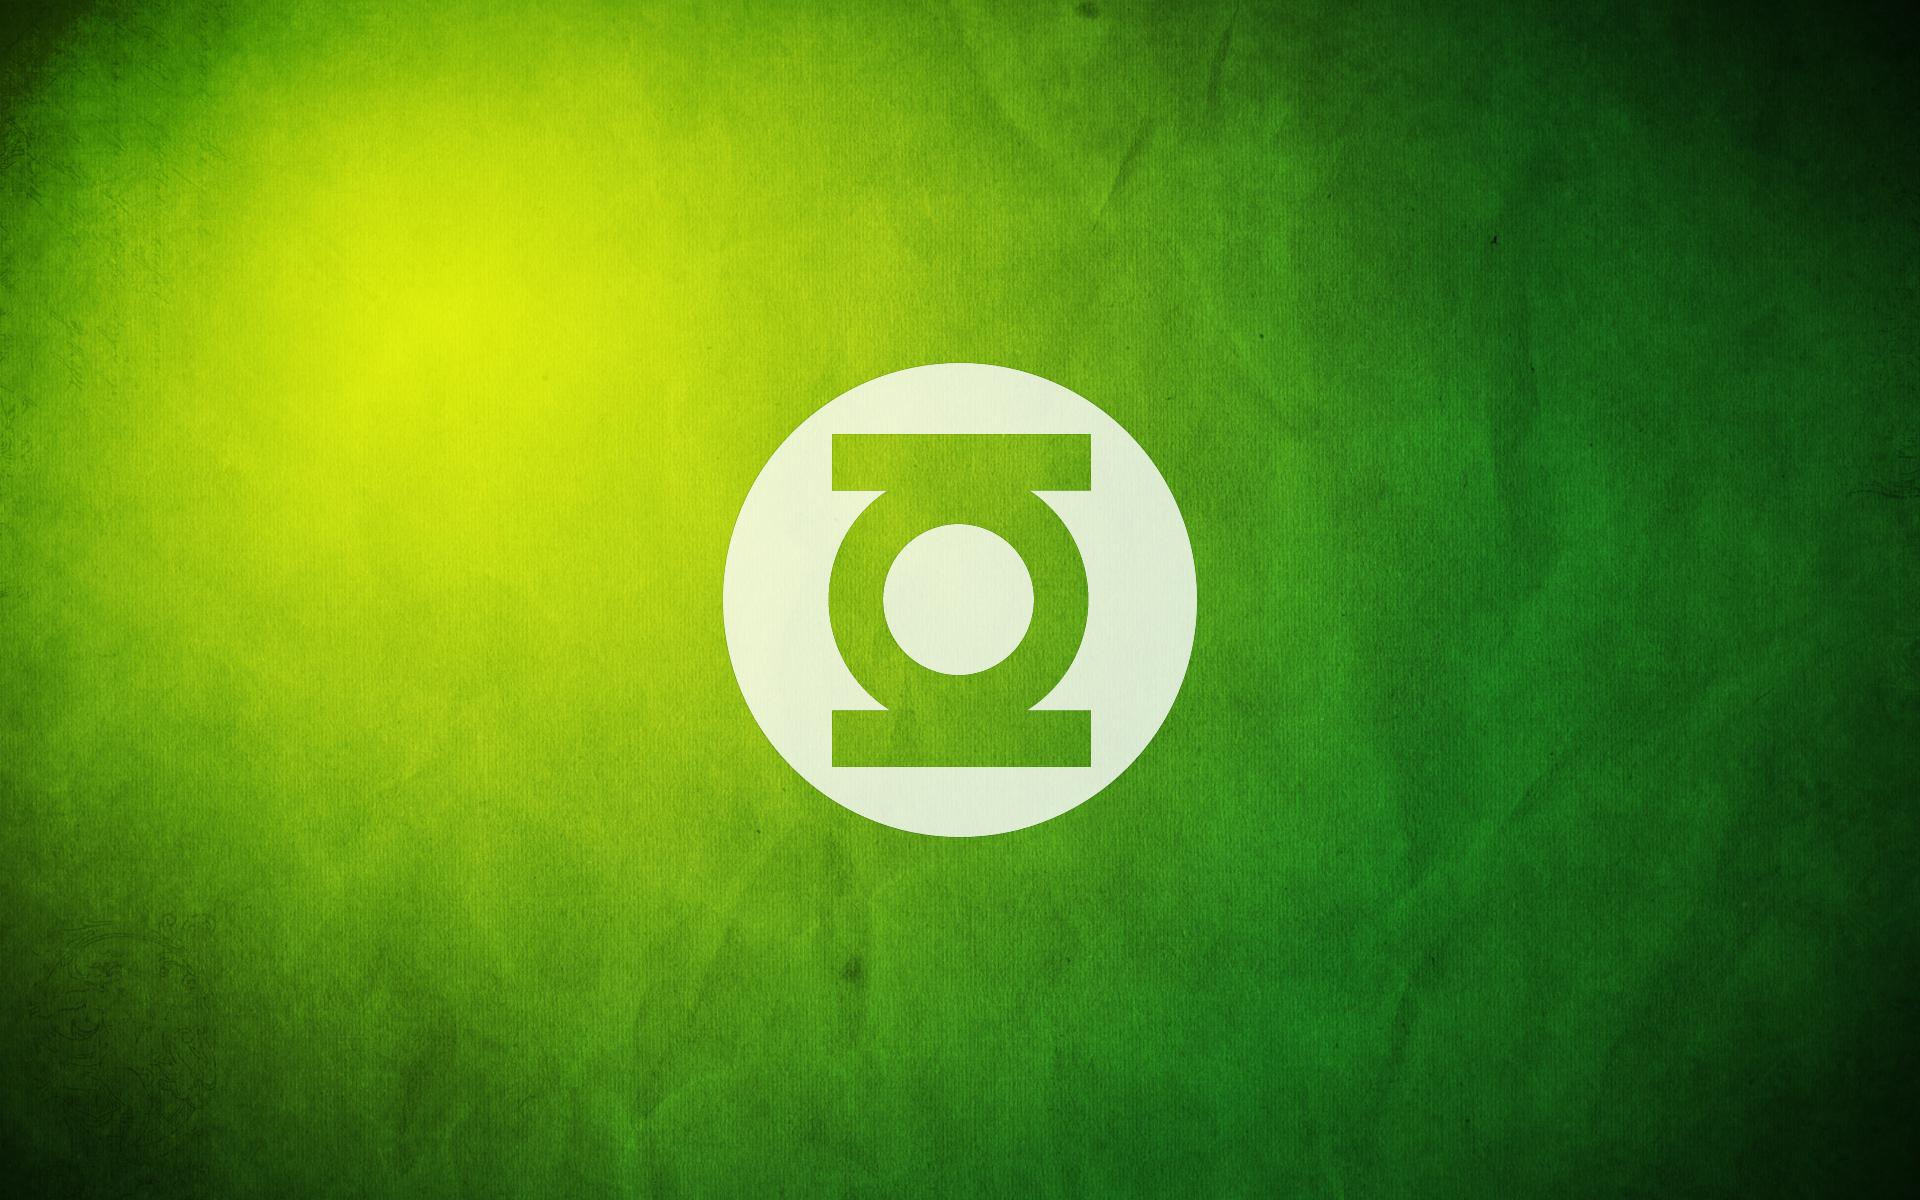 Green Lantern Logo Wallpaper